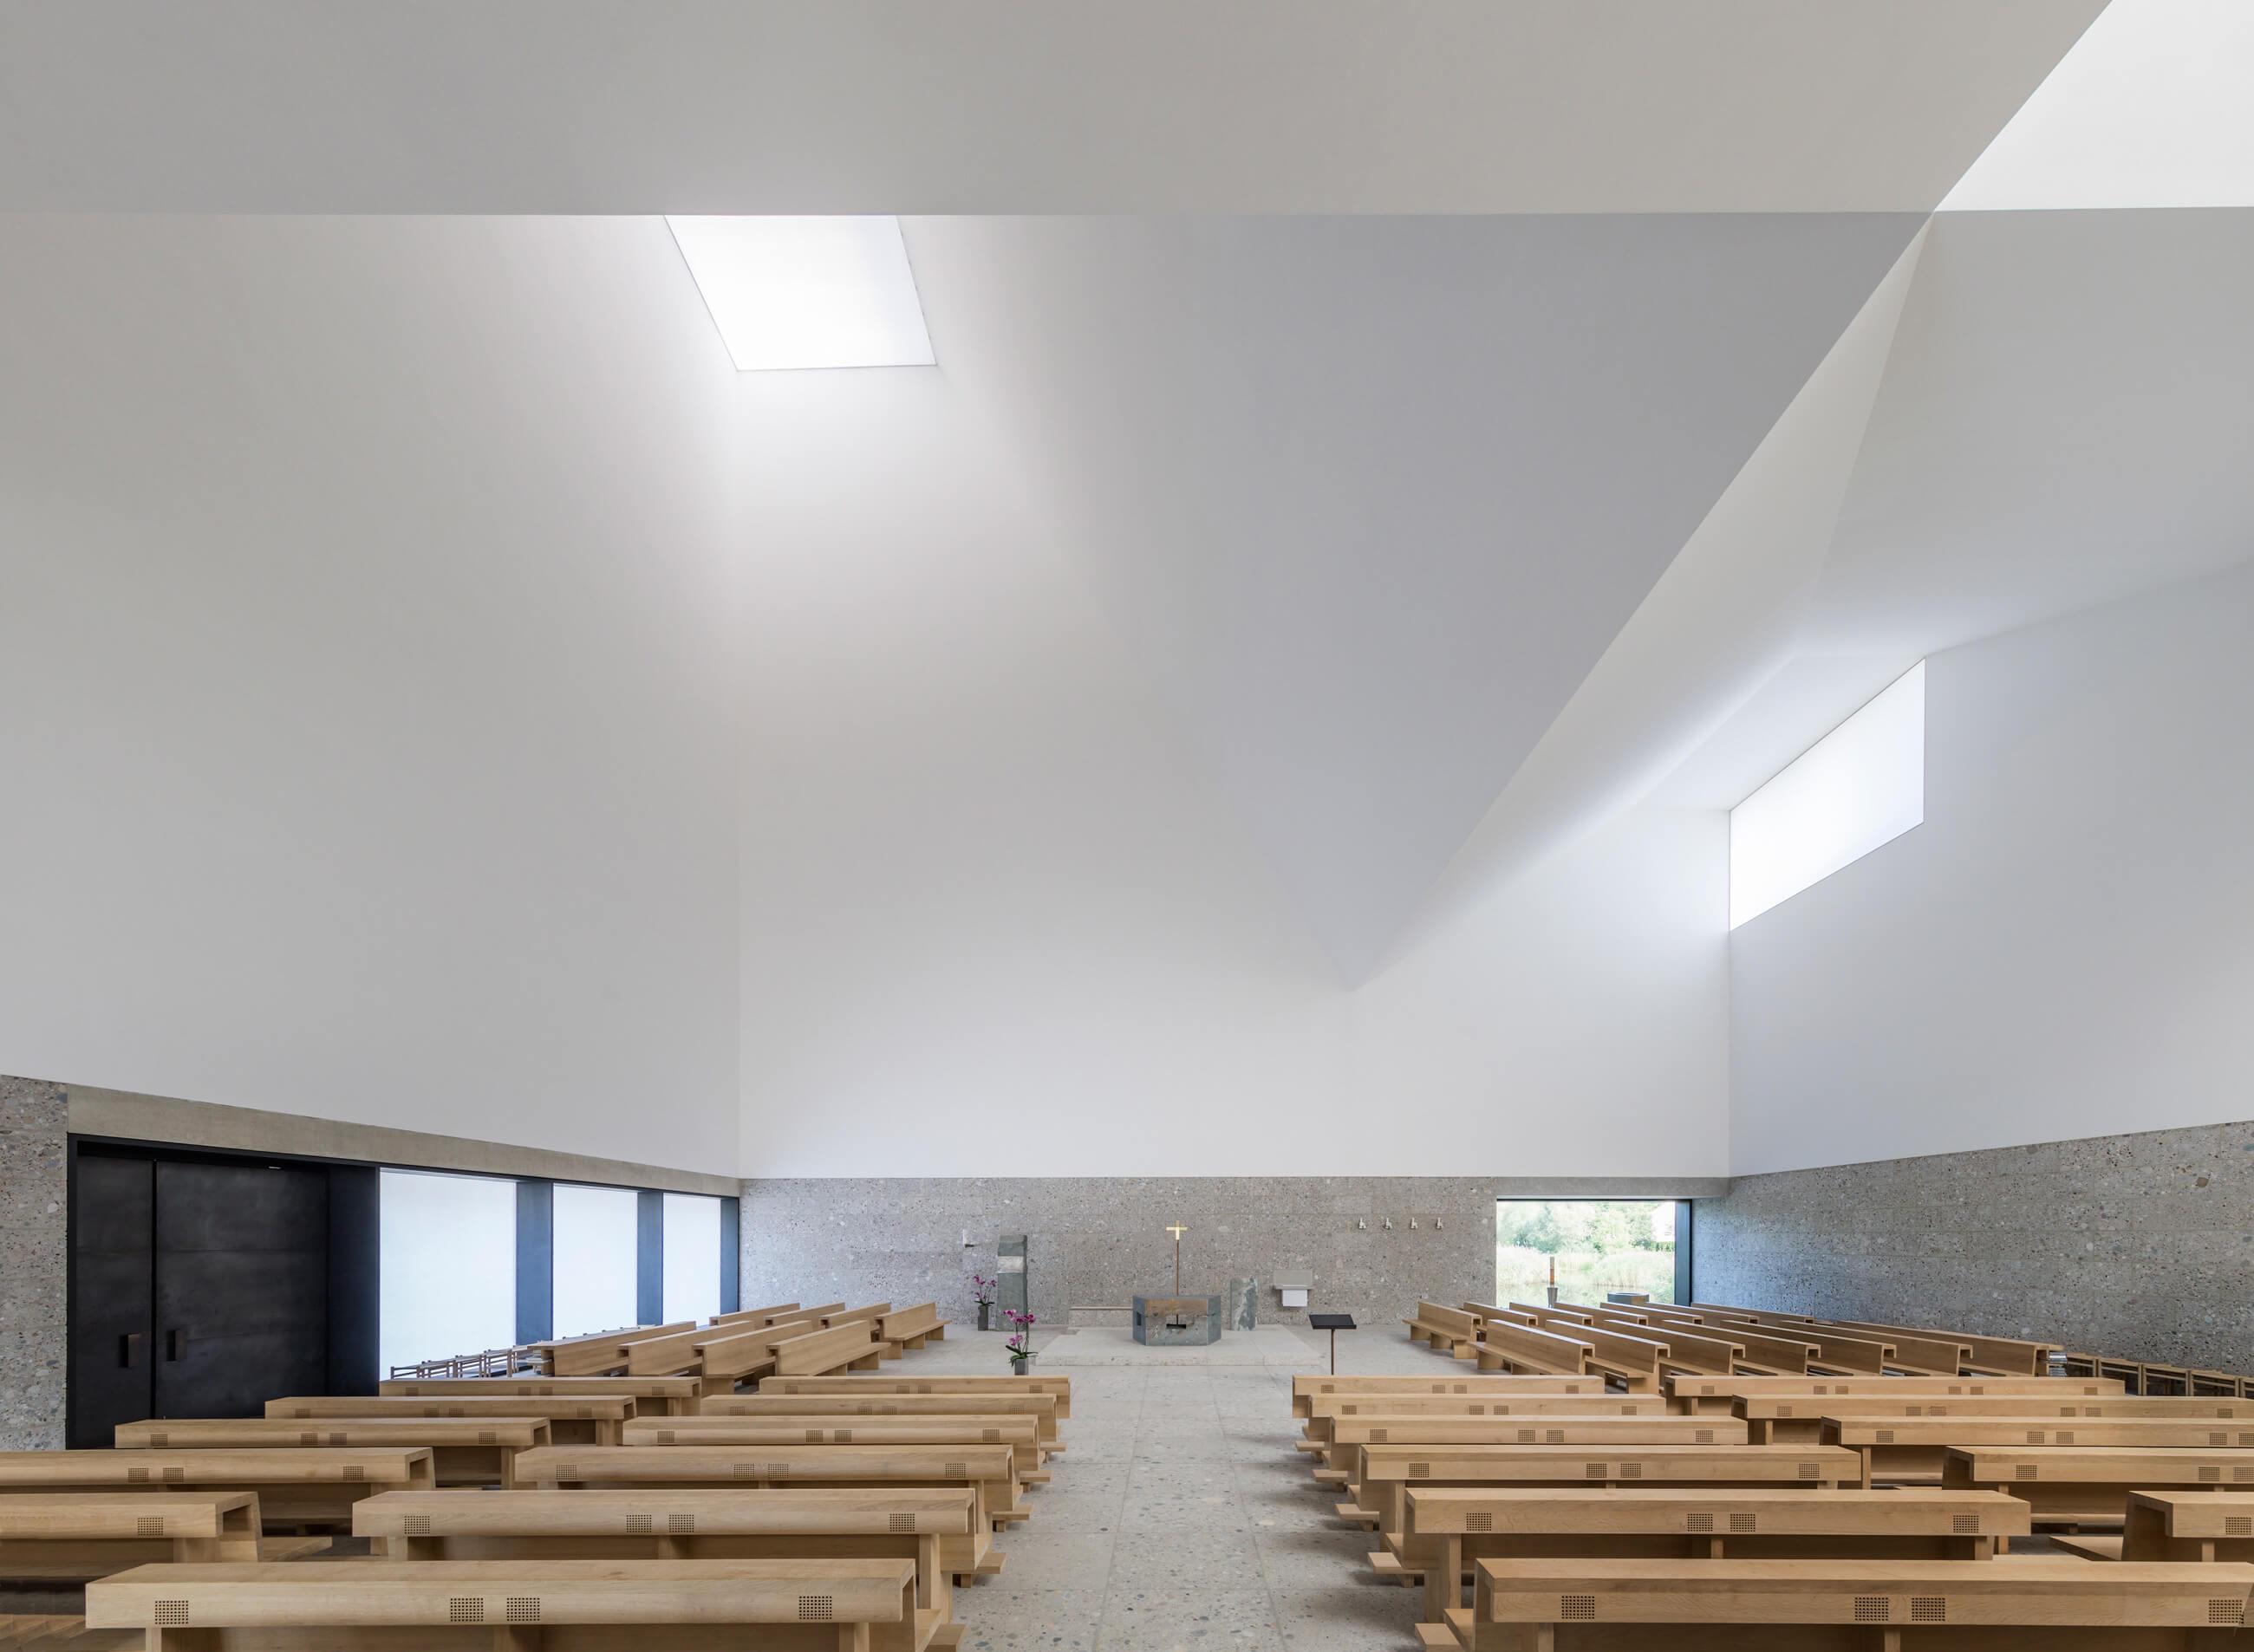 Kirchenzentrum Seliger Pater Rupert Mayer, Poing